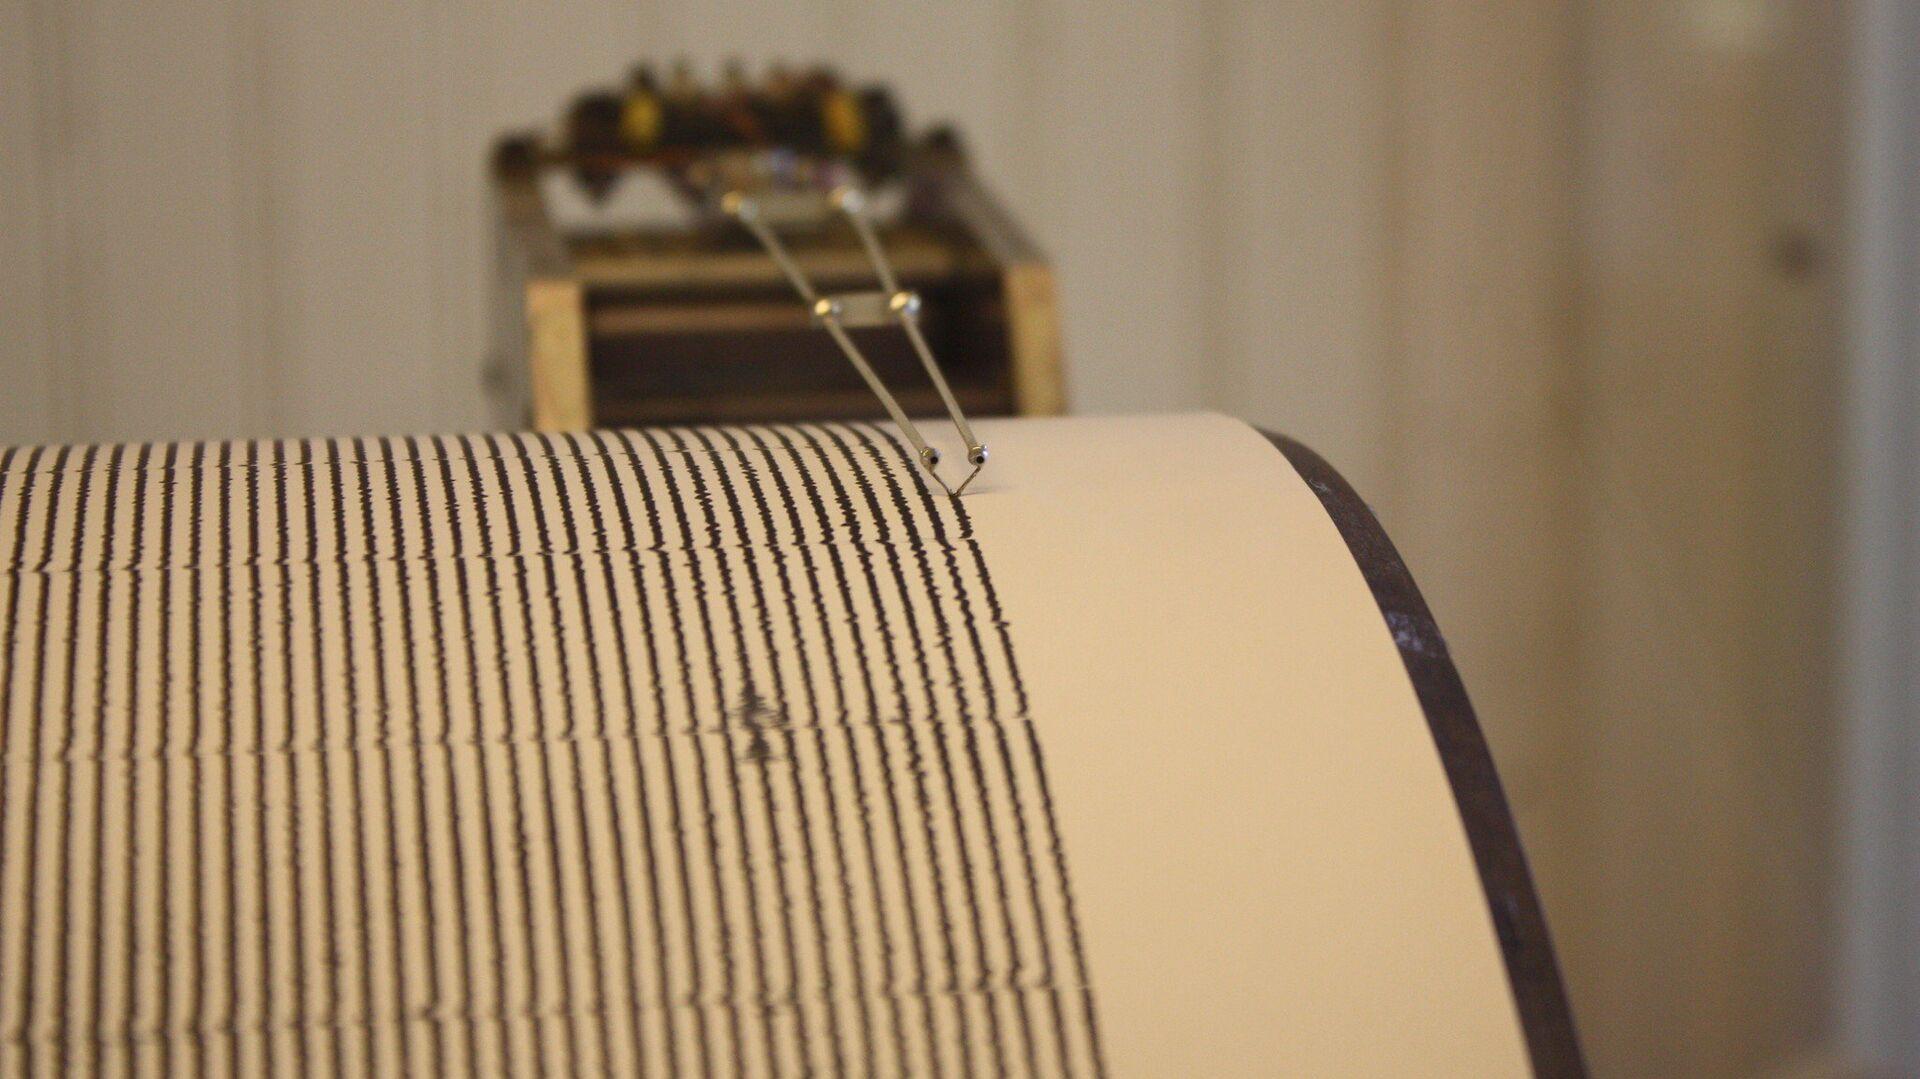 Sismografo per terremoto - Sputnik Italia, 1920, 04.07.2021